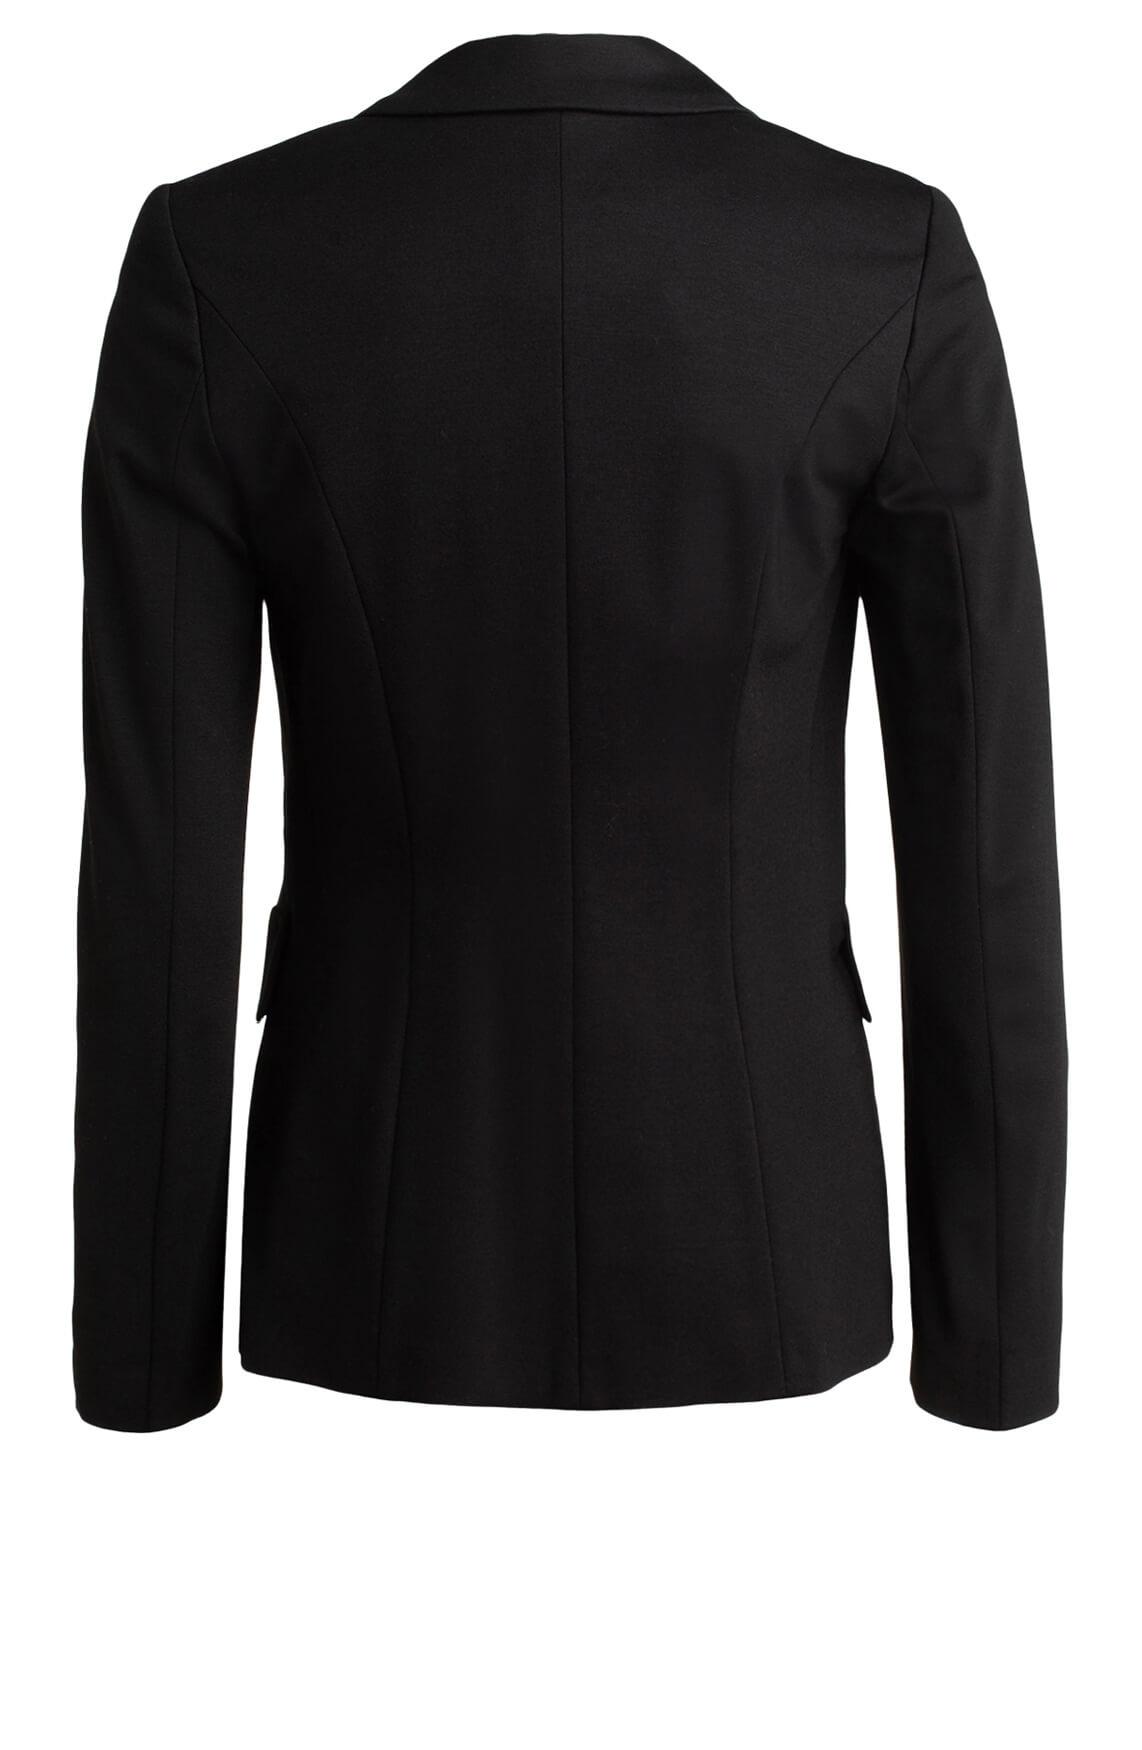 Marccain Sports Dames Klassieke blazer zwart